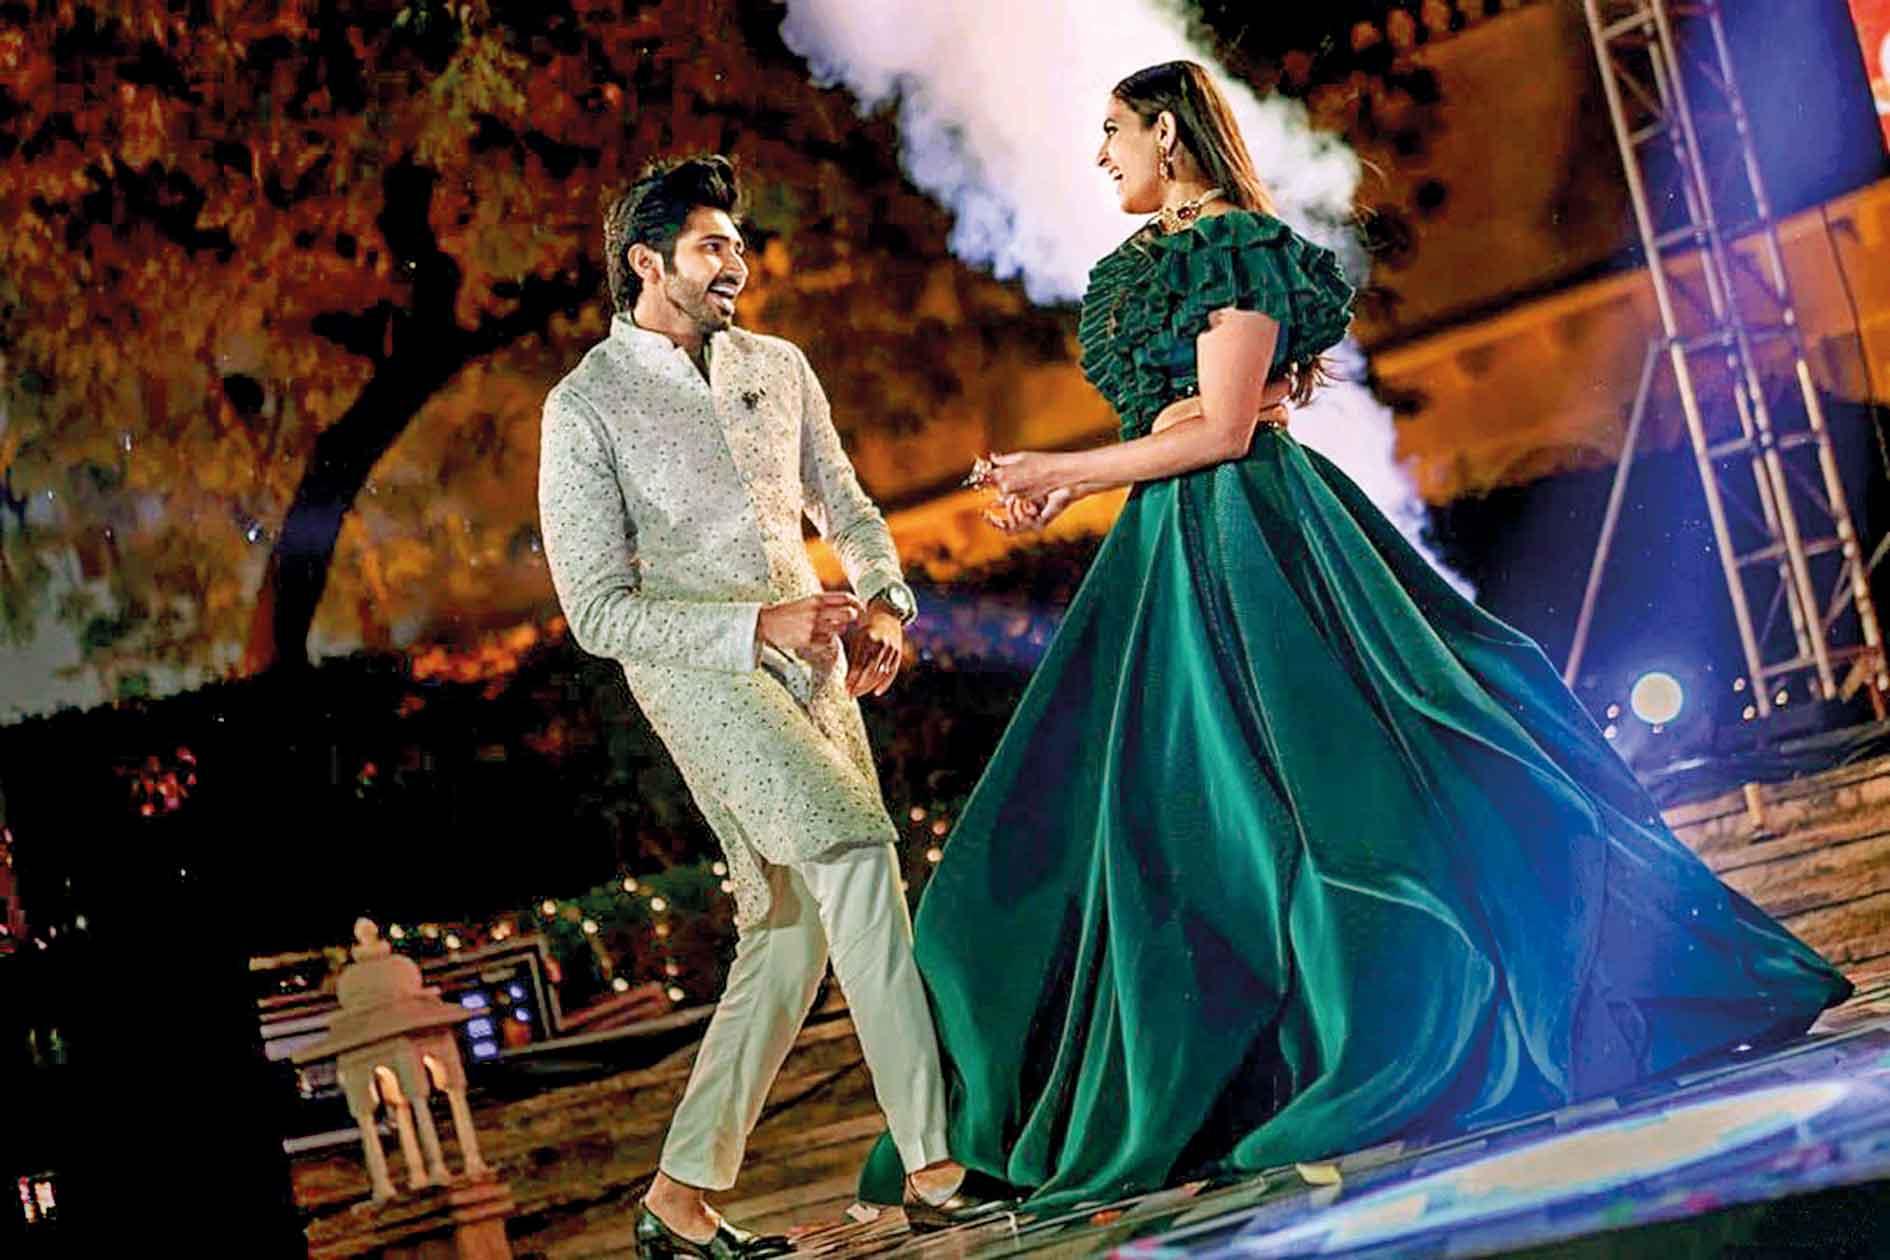 Exclusive: Niharika Konidela and Chaitanya Jonnalagadda's wedding theme revealed! | Telugu Movie News - Times of India